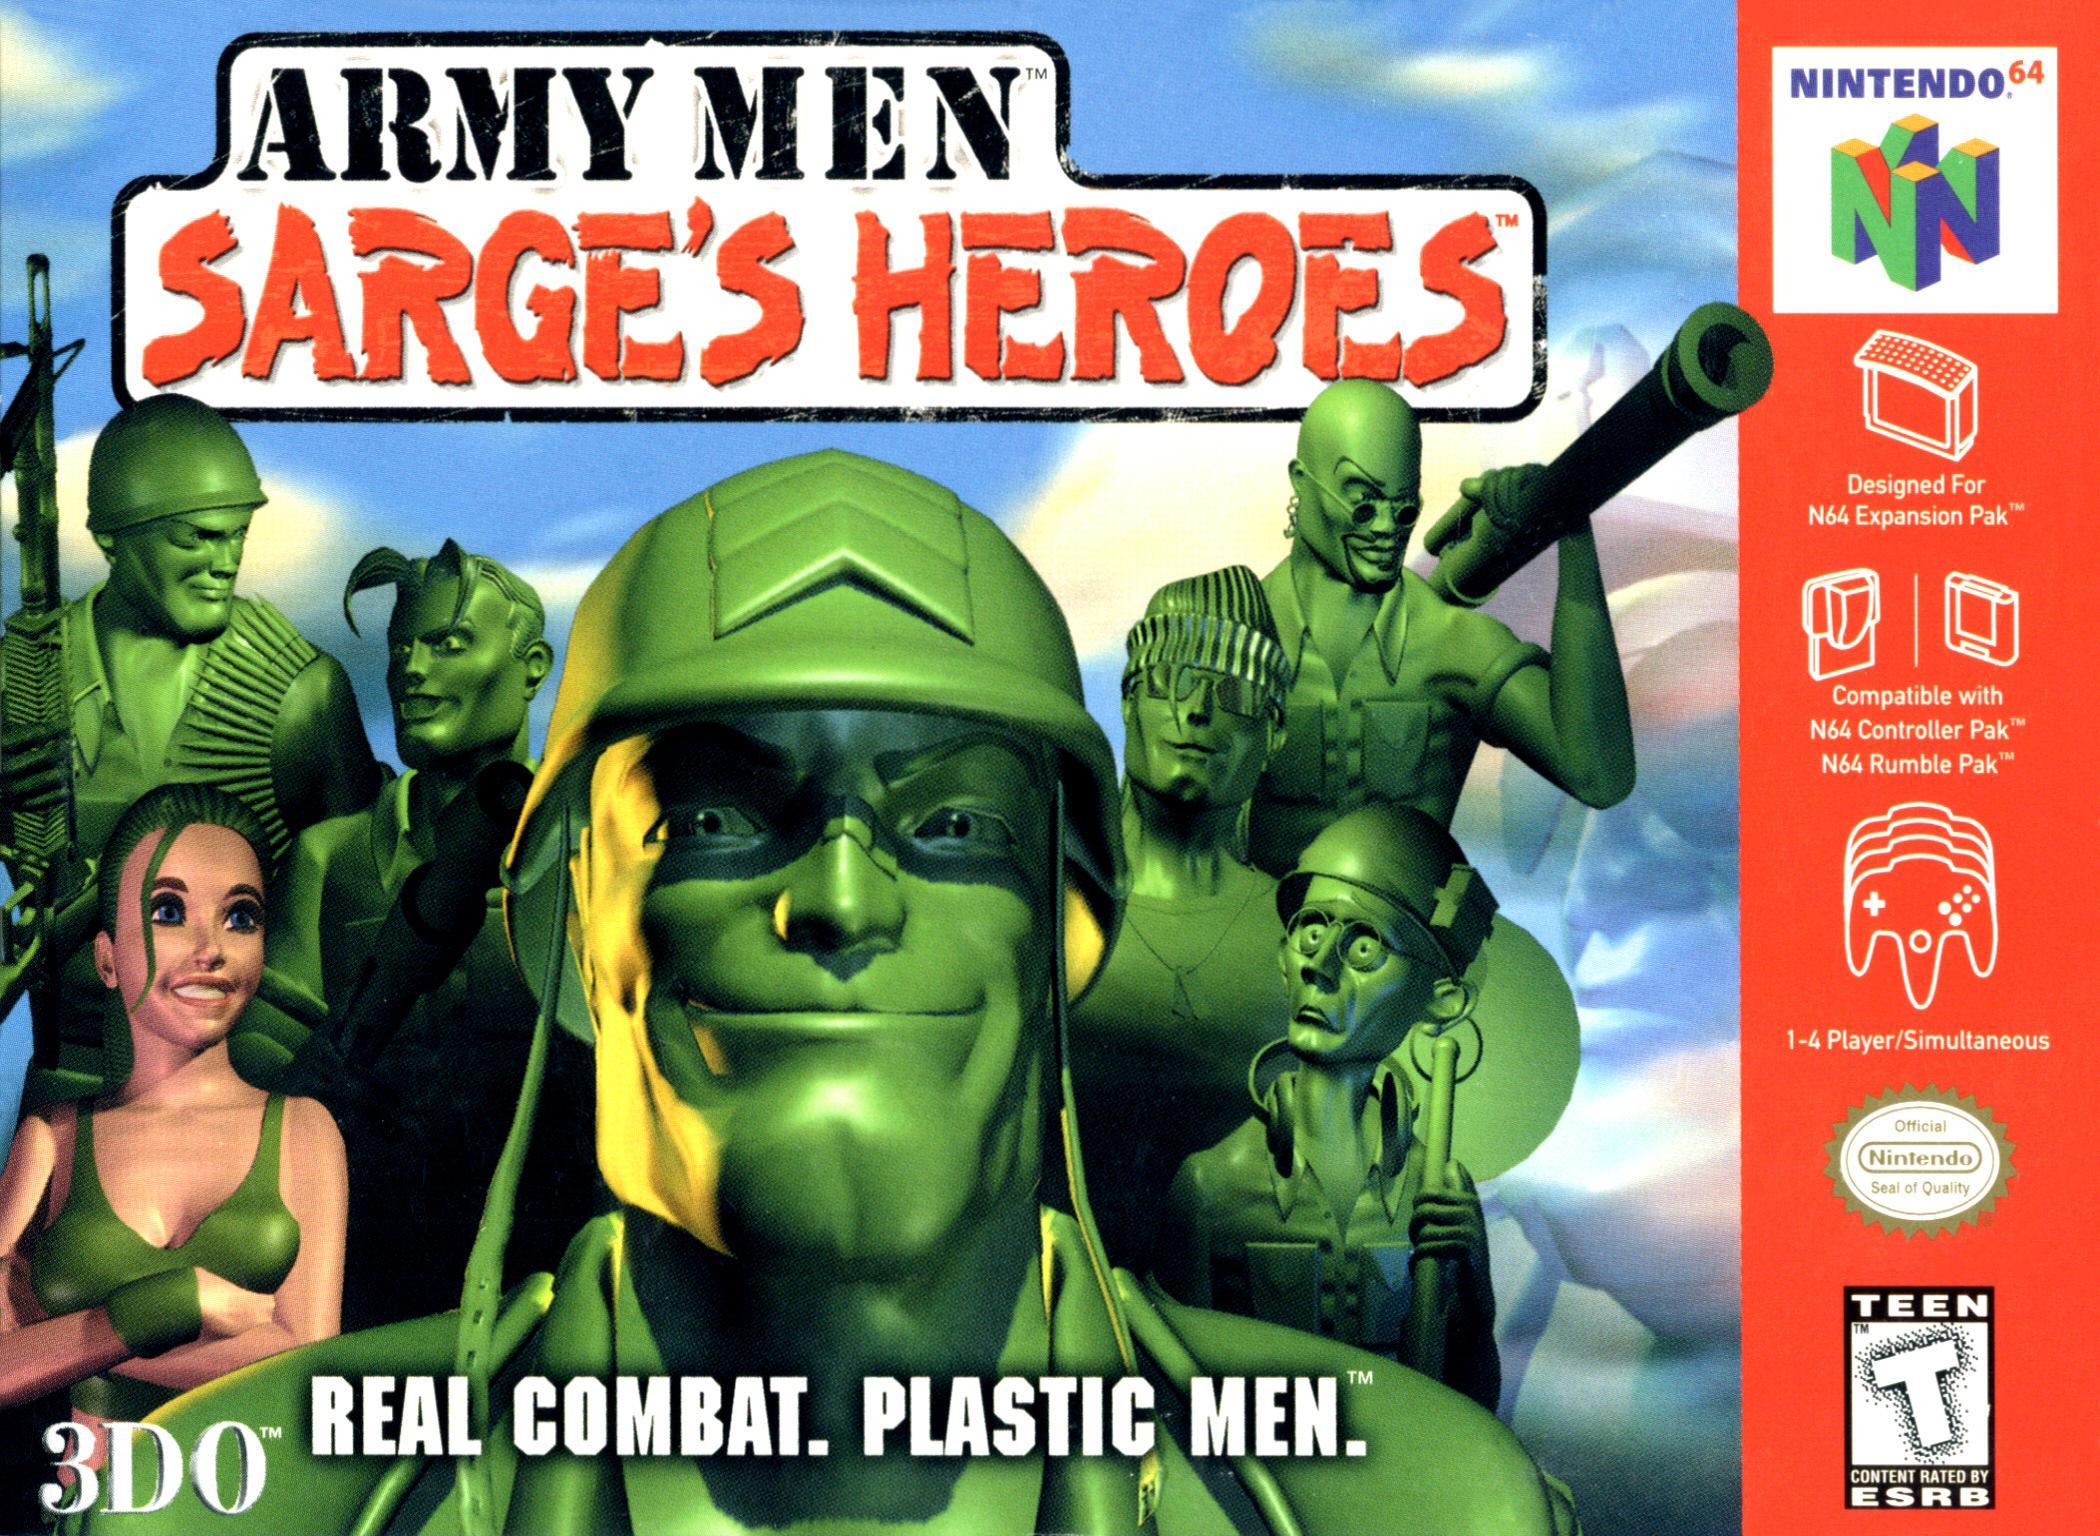 30 Day Video Game Challenge N64_NA_ArmyMenSargesHeroes